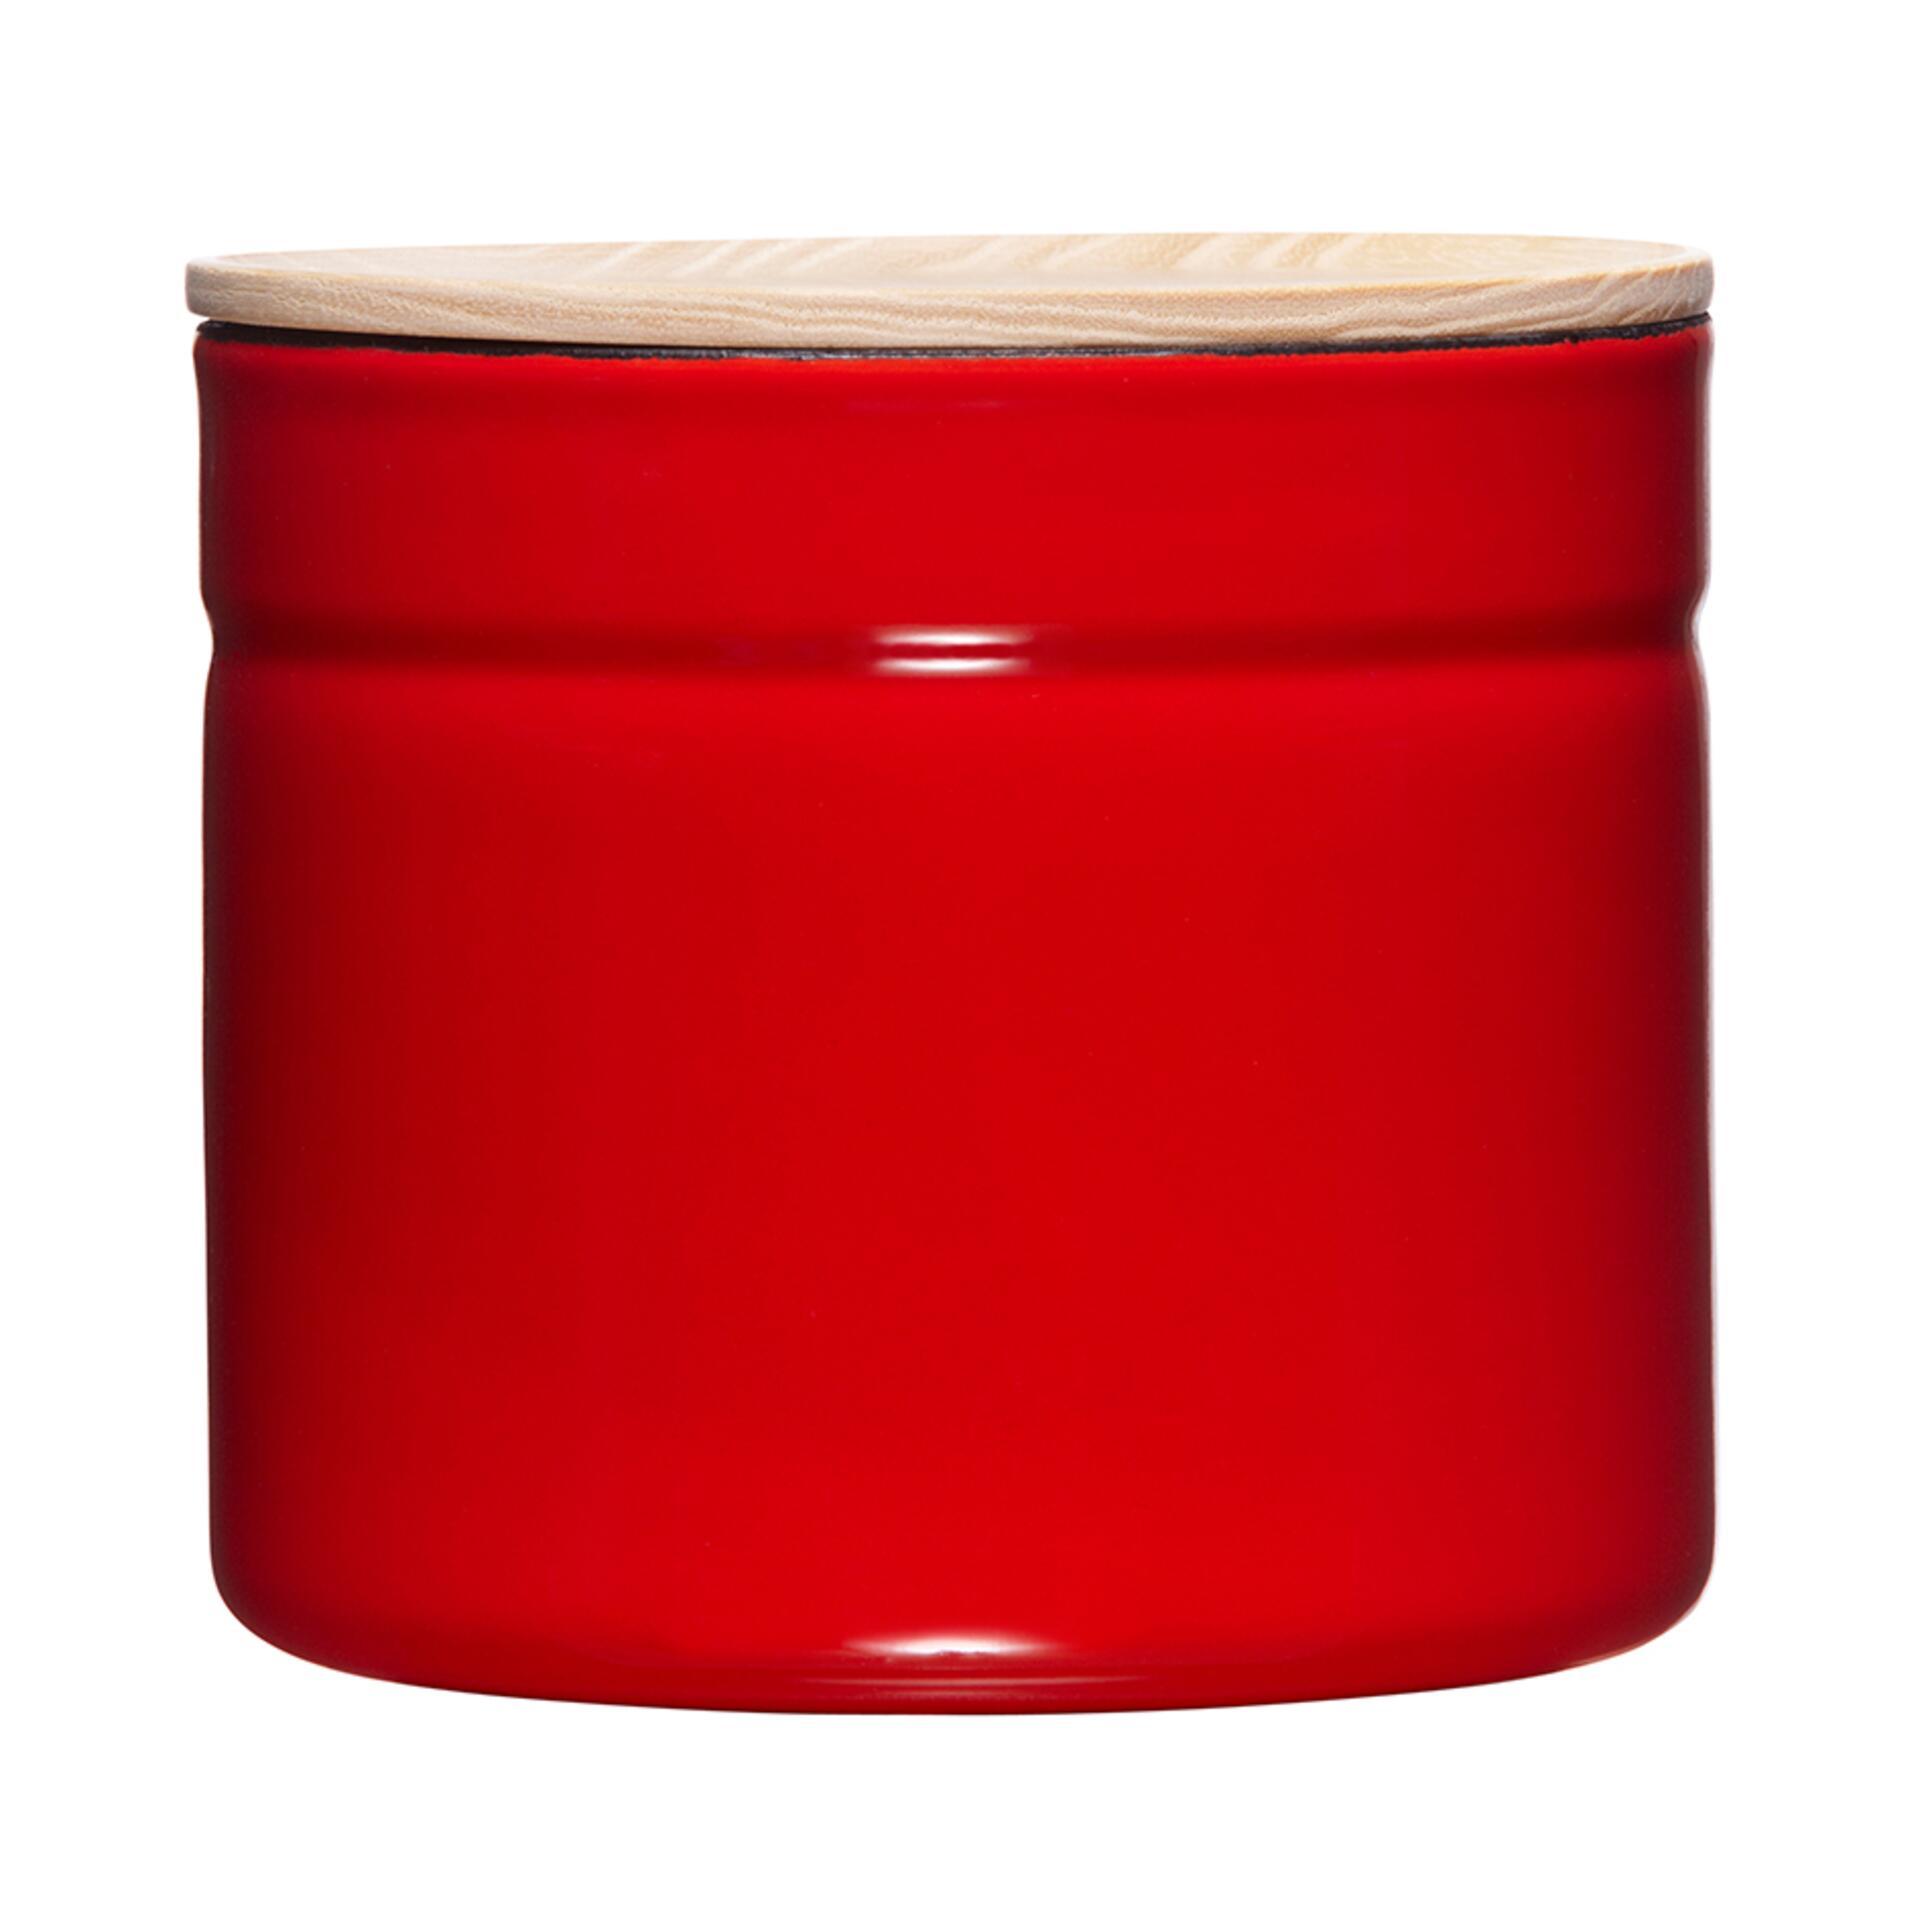 Riess Vorratsdose 1350 ml Rot